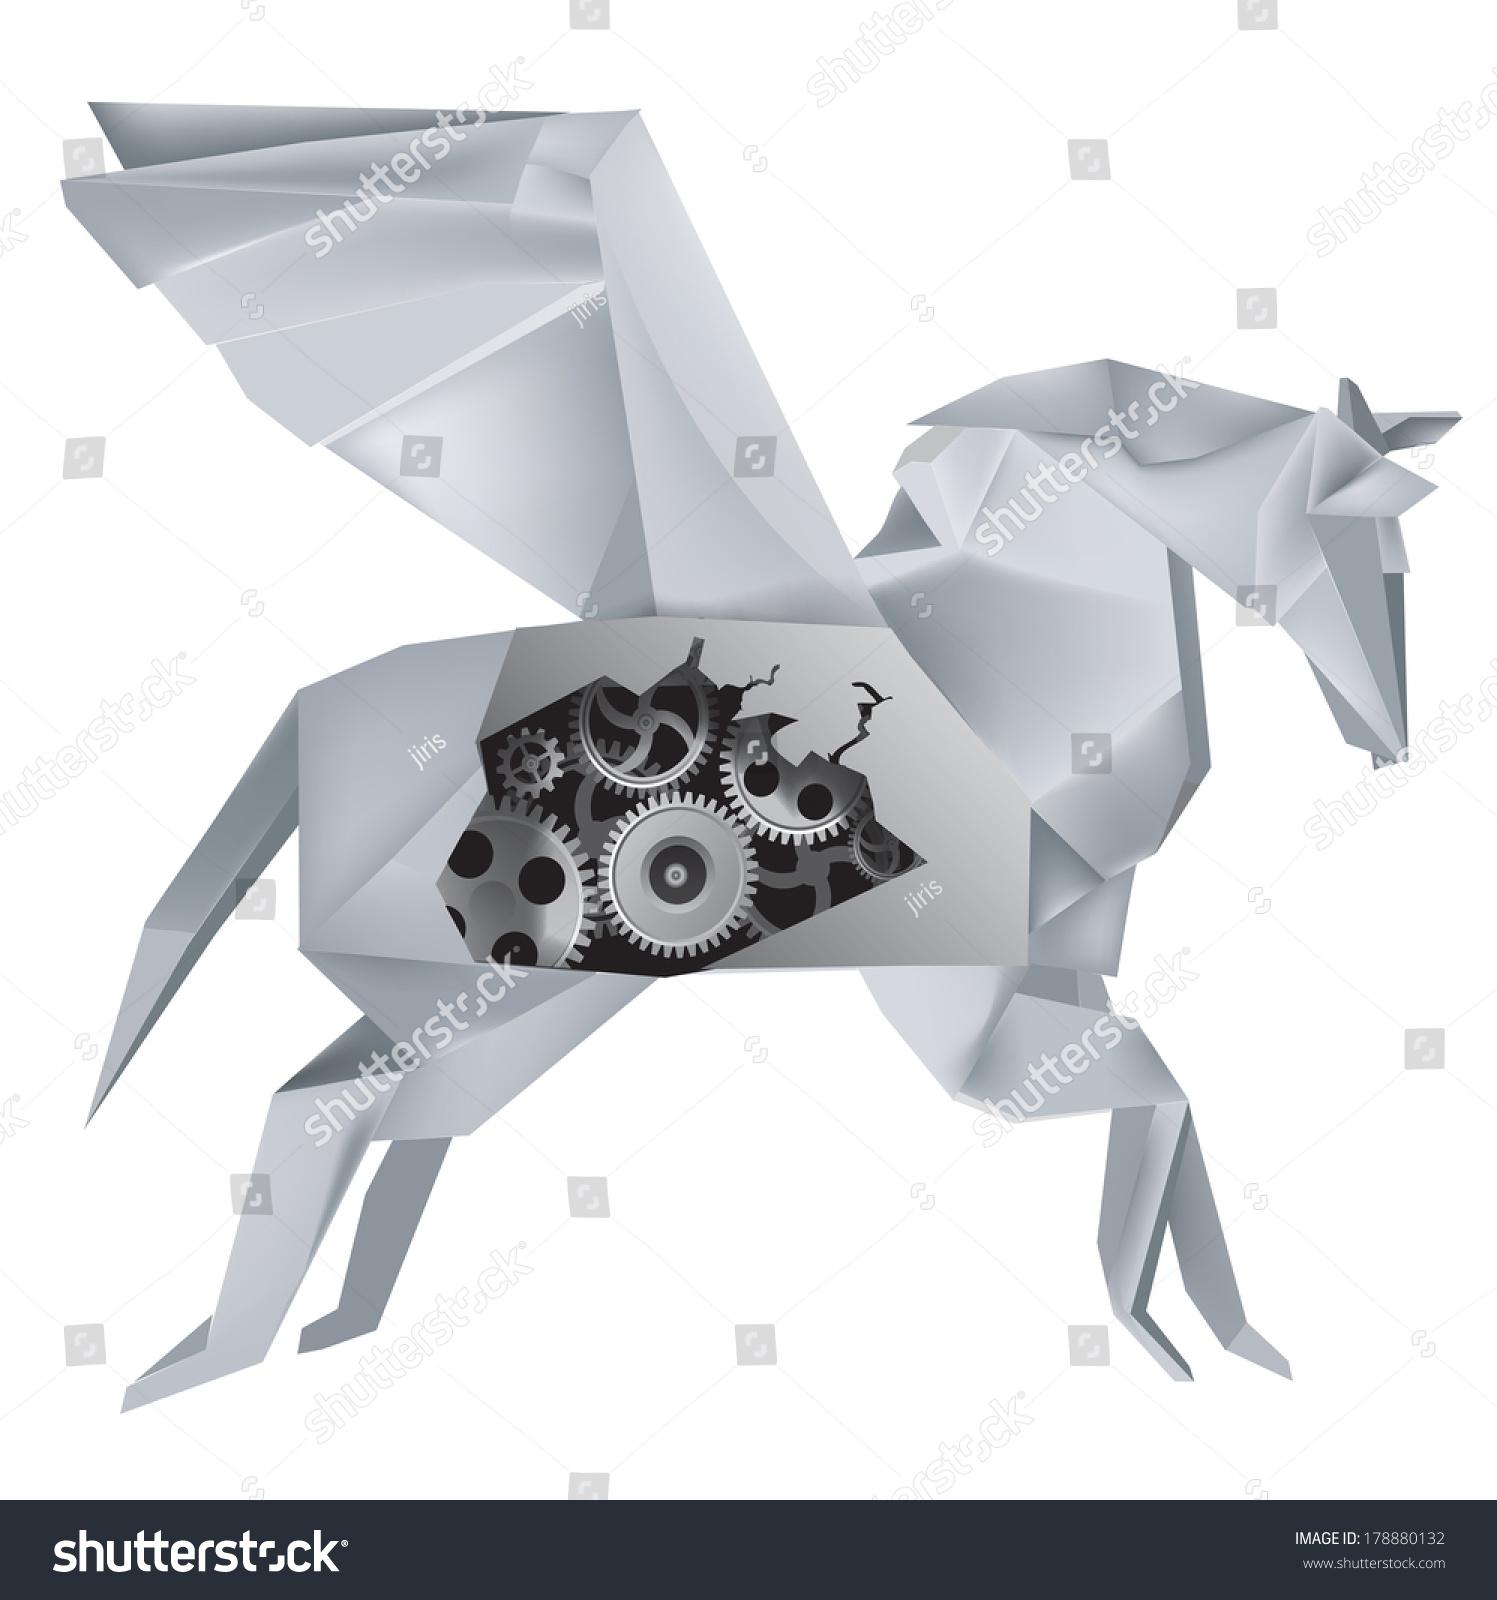 Origami Mechanical Pegasus Imaginary Mechanical Origami Stock Vector